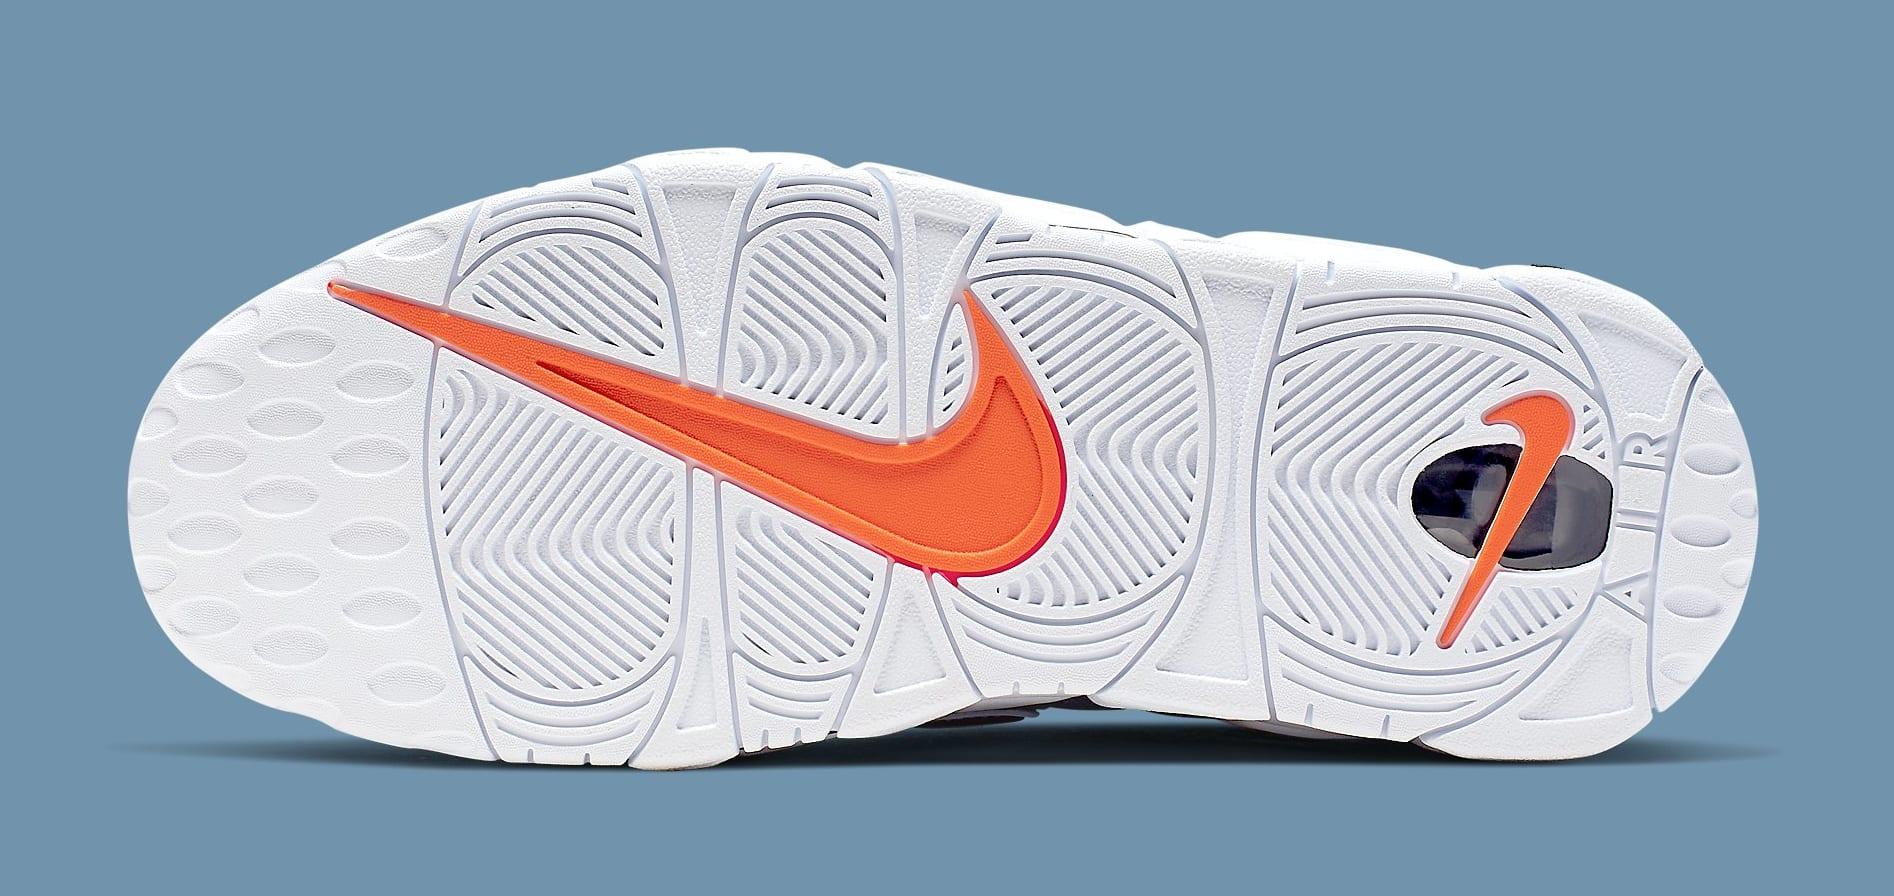 Nike,AIR,Air More Uptempo,CJ61 单宁材质「大 AIR」下周发售!上脚也格外帅气!